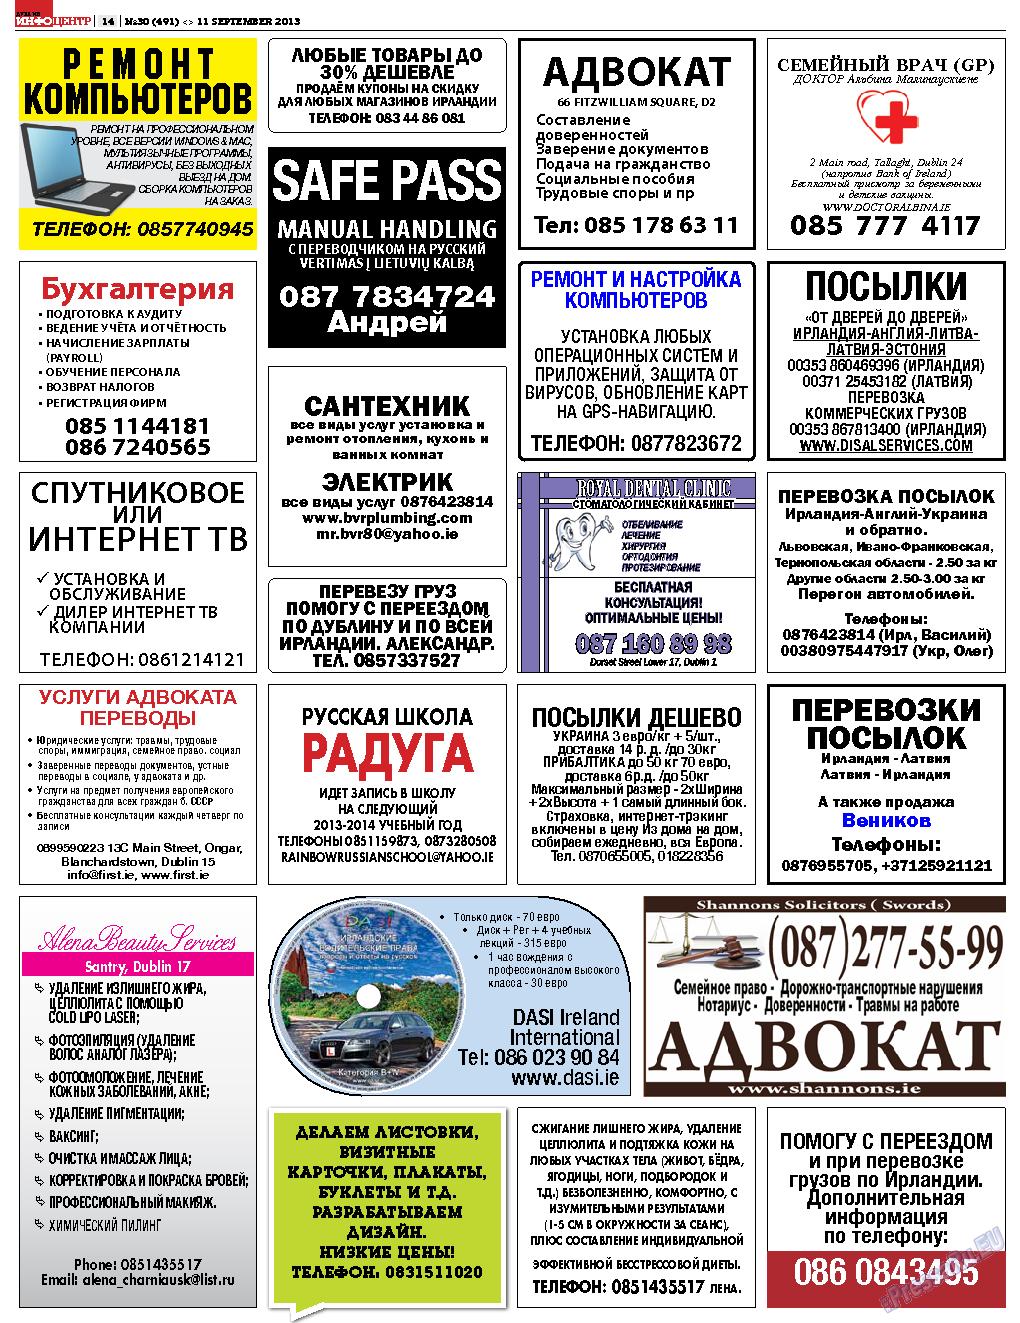 Дублин инфоцентр (газета). 2013 год, номер 30, стр. 14